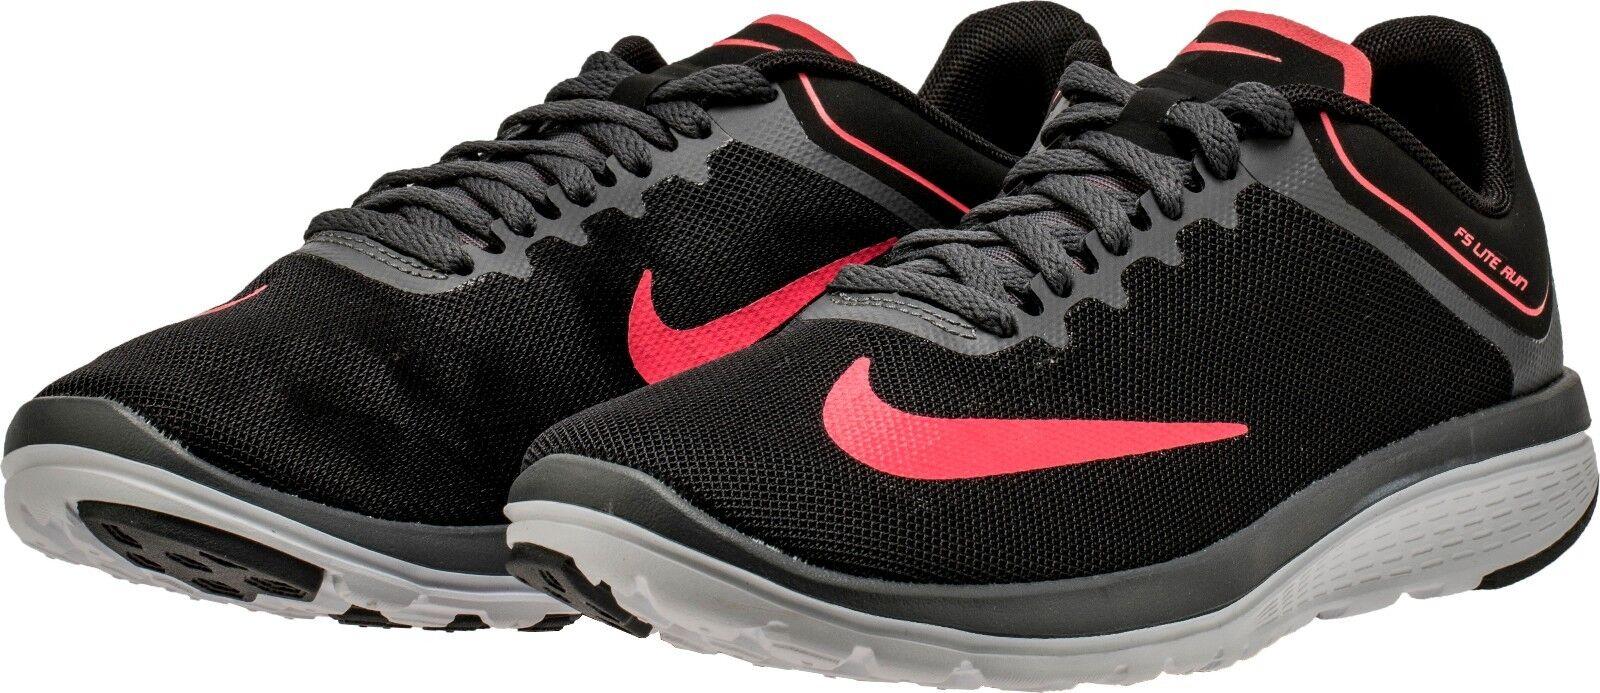 Nike Mujeres SELLADOS DE FÁBRICA LITE RUN 4 Negro Hot Punch 852448-011 Talla 6 6.5 10